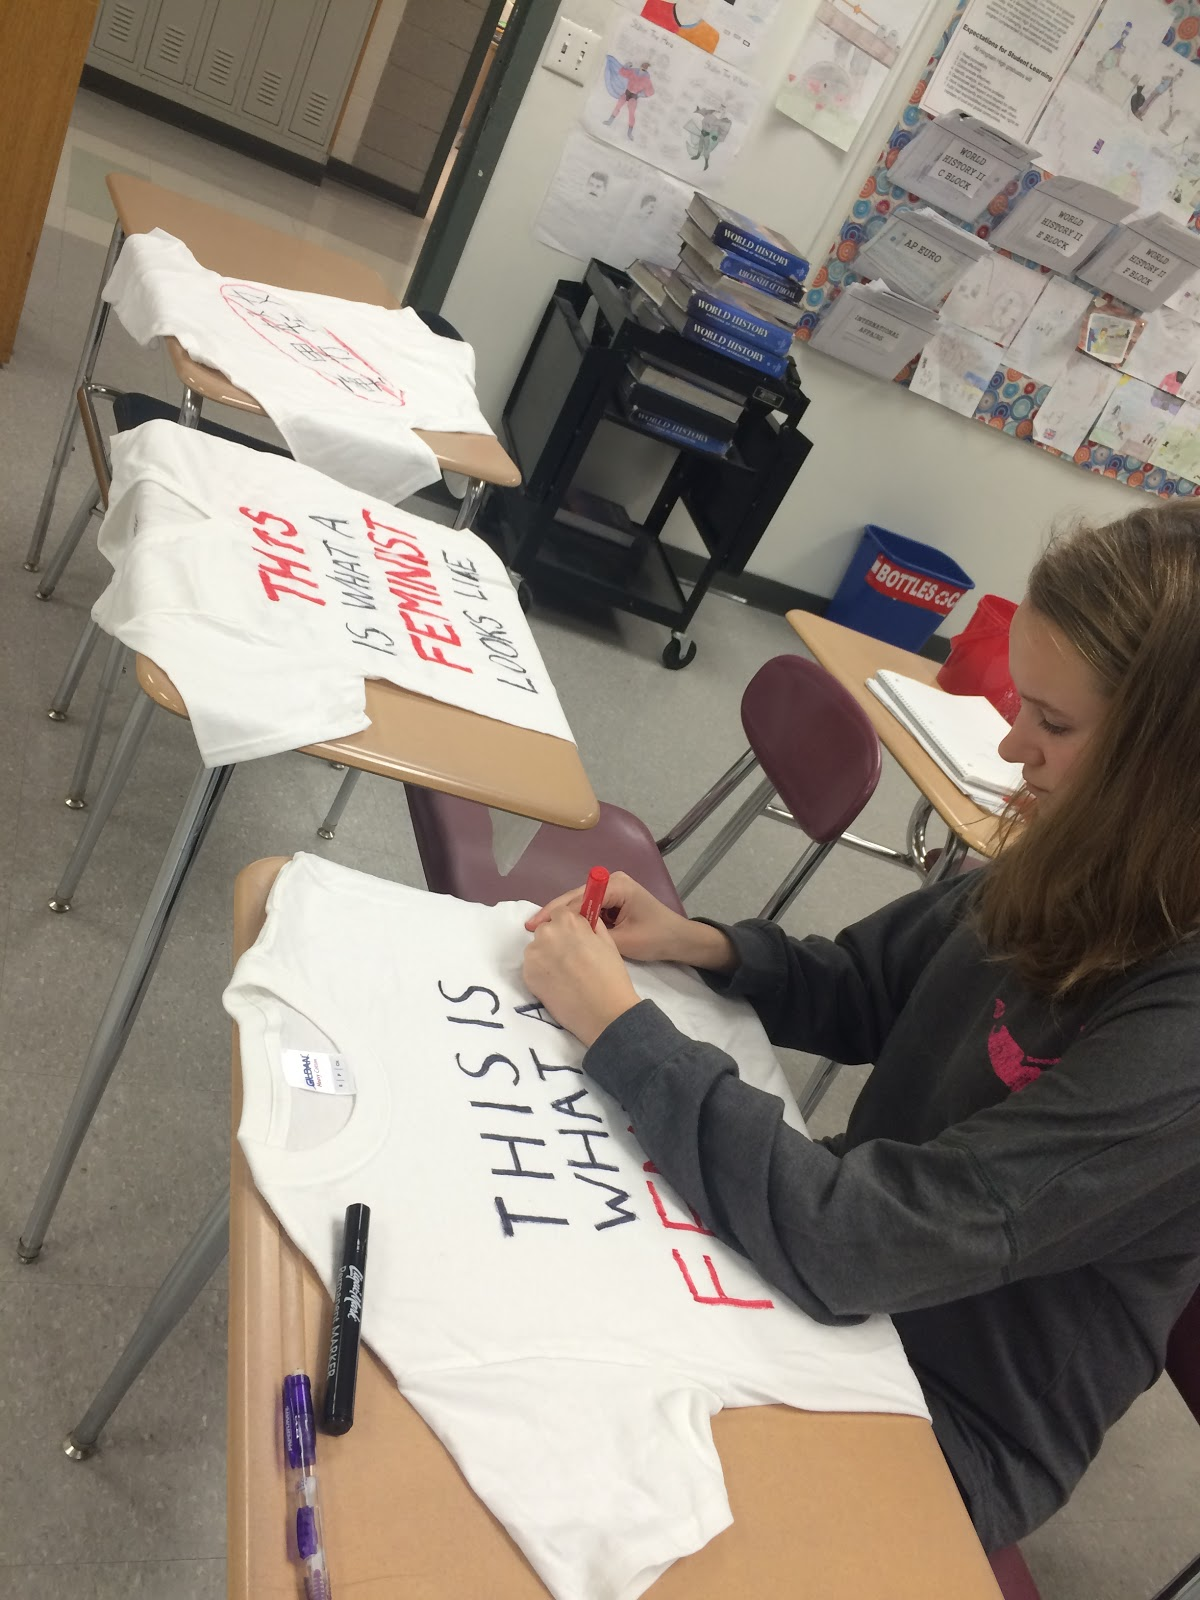 Clara Kingsbury, a freshman, designs her own t-shirt.